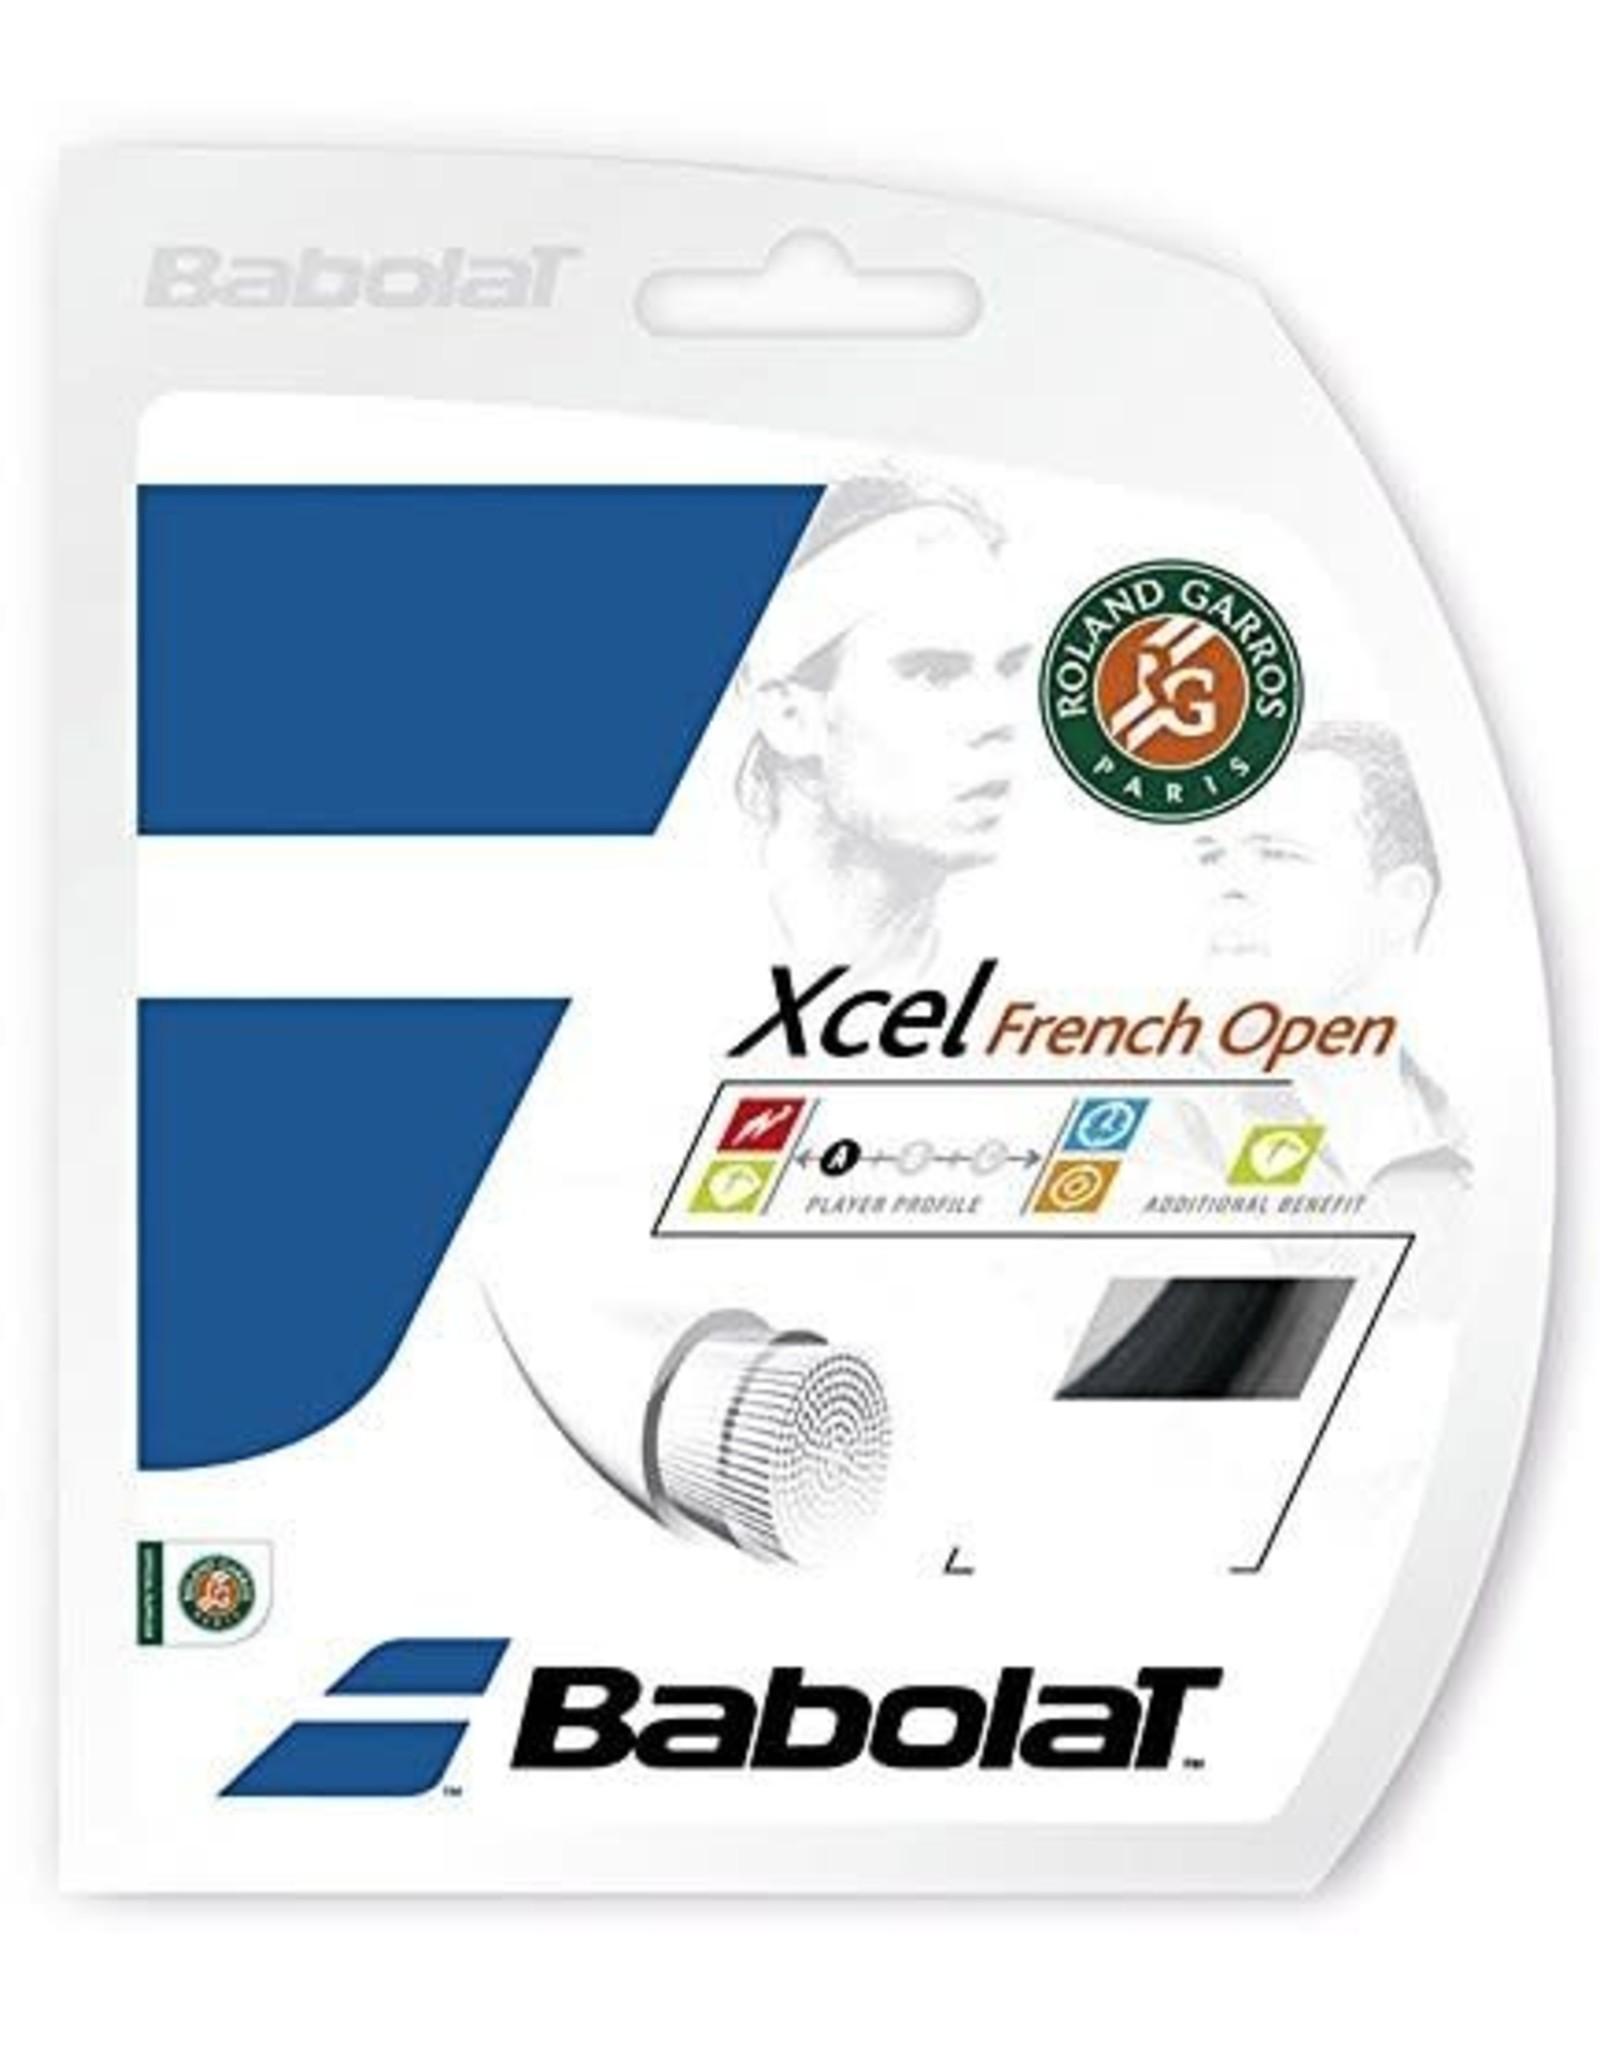 Babolat Xcel French Open